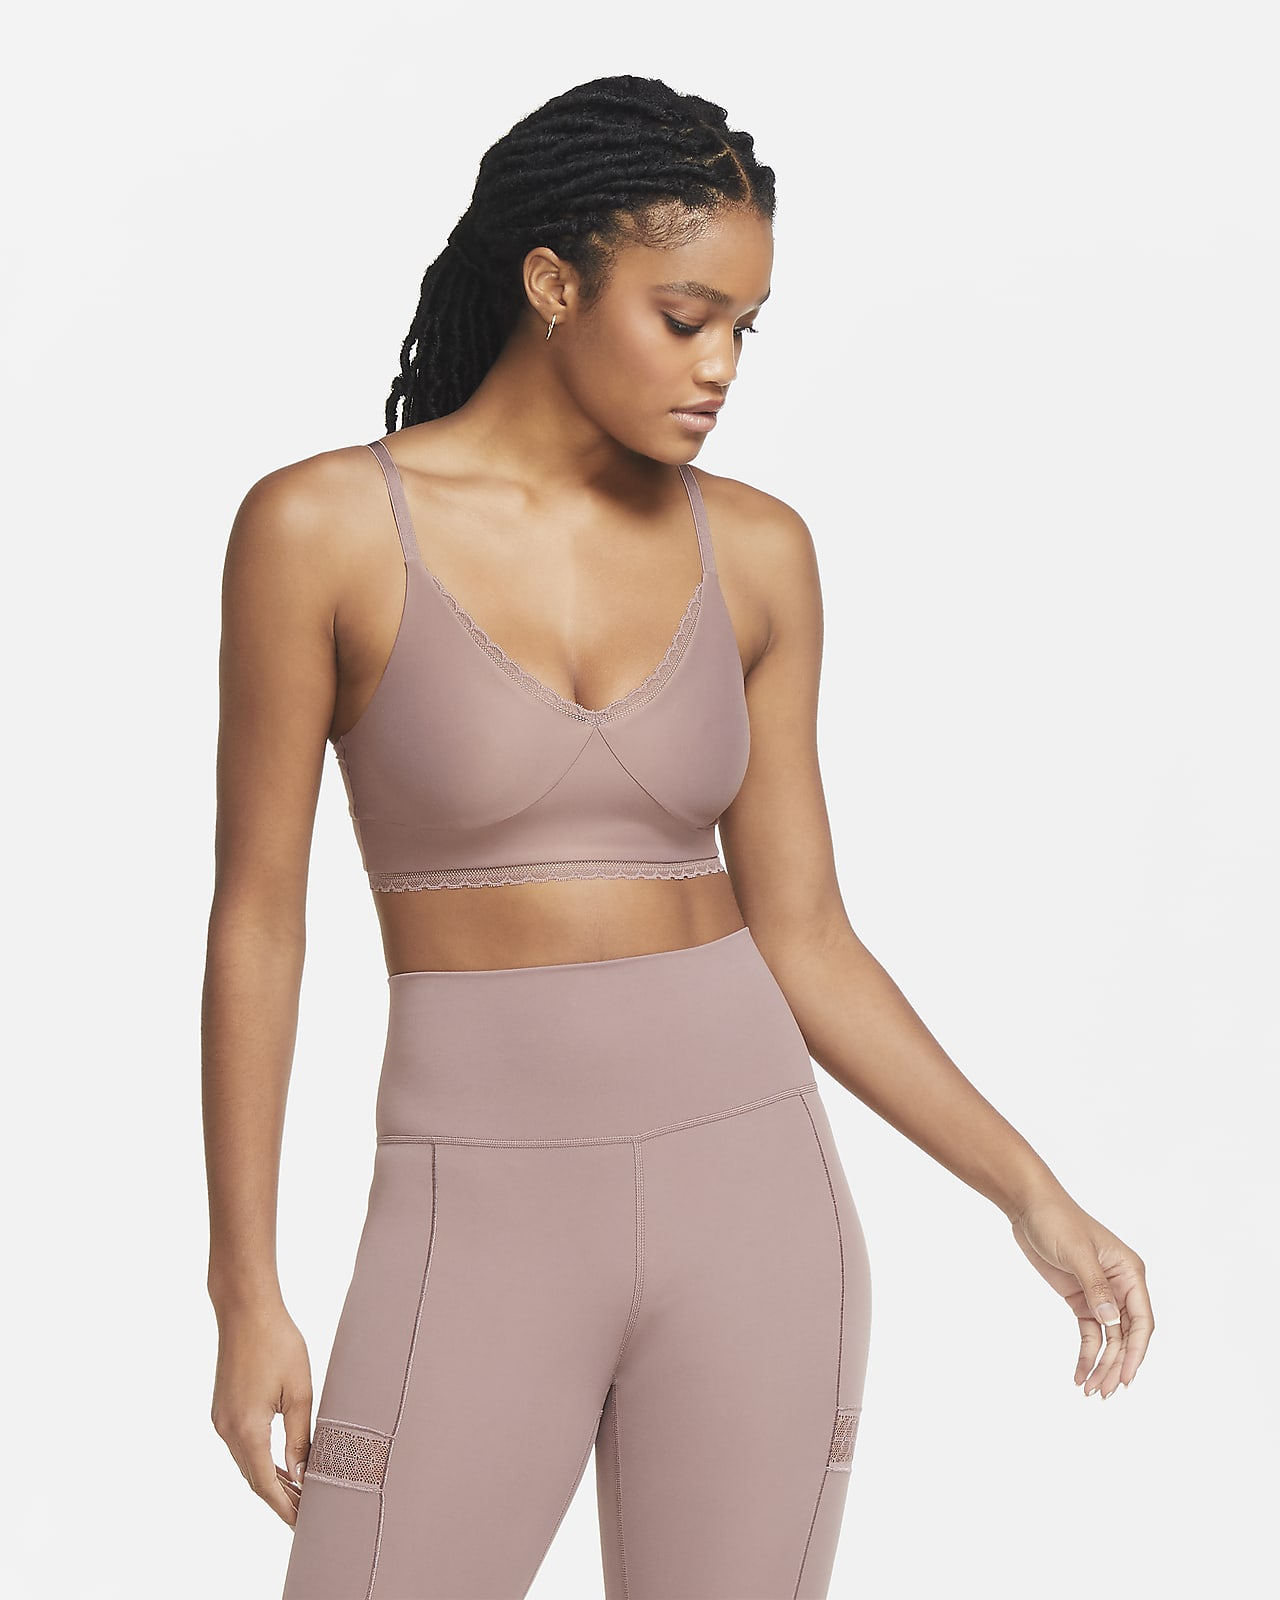 Nike Indy Luxe Women's Light-Support Sports Bra